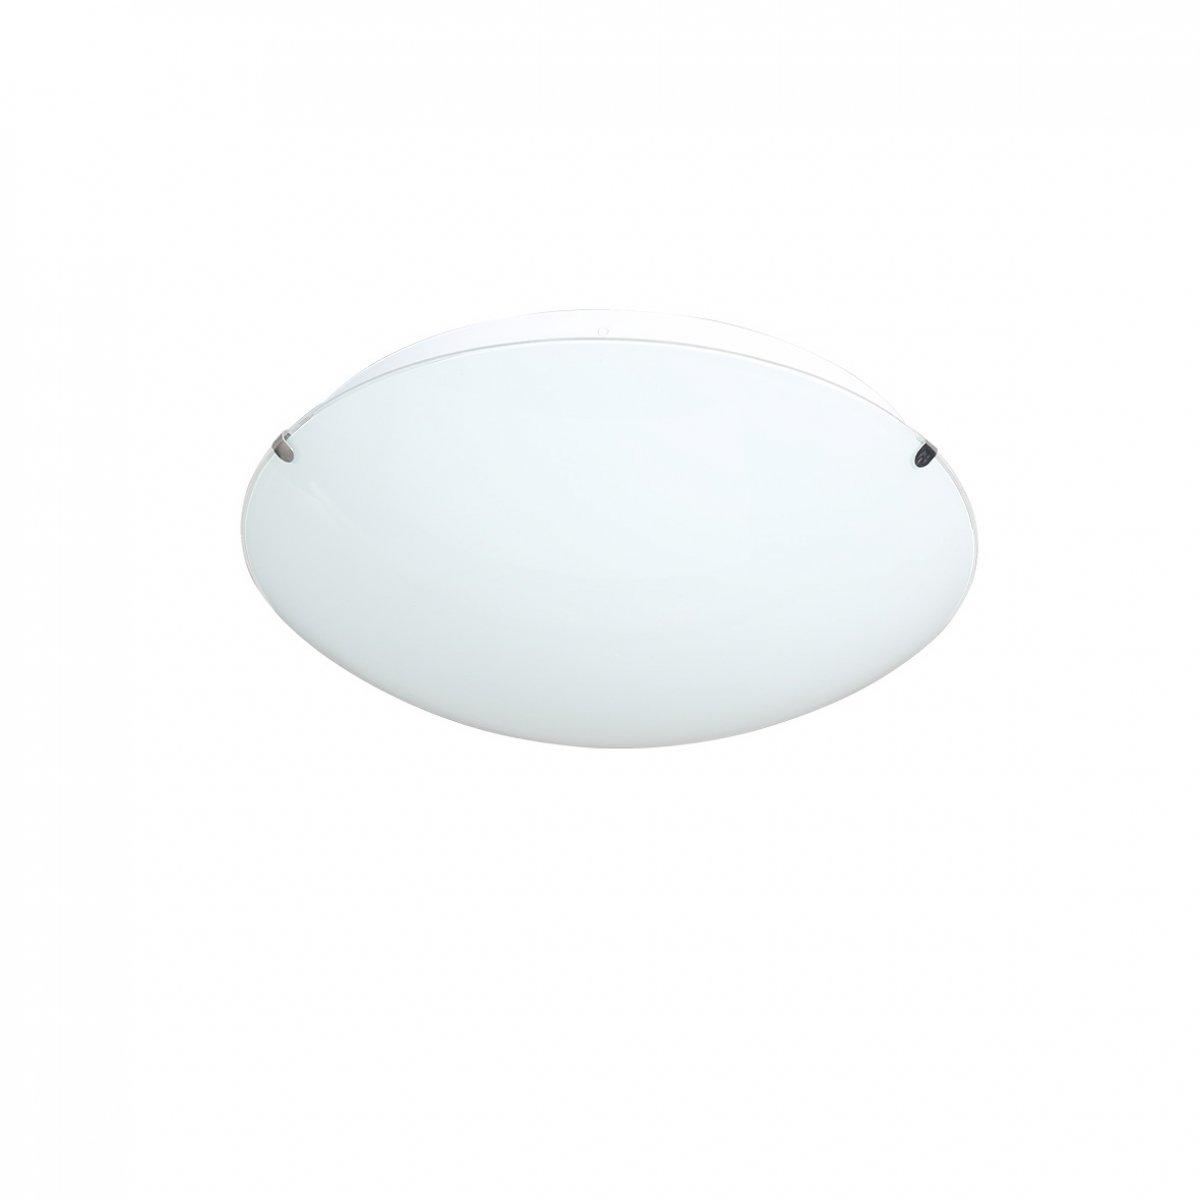 WOFI Leuchten LED Deckenleuchte LORENZ Nickel matt, 1-flammig, EUR ...